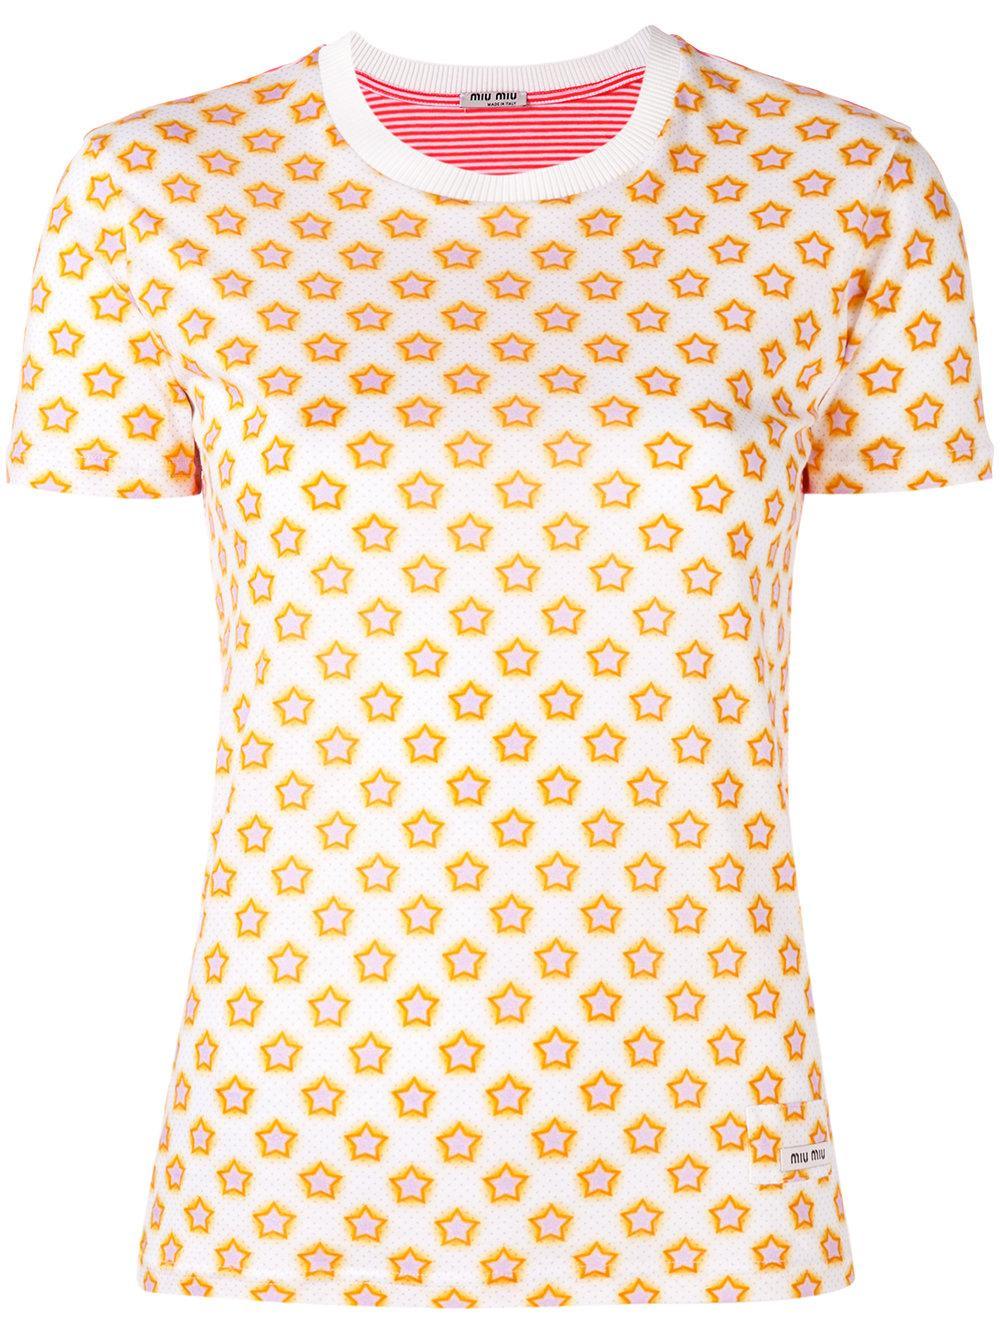 Miu miu star print t shirt women cotton xs lyst for Miu miu t shirt